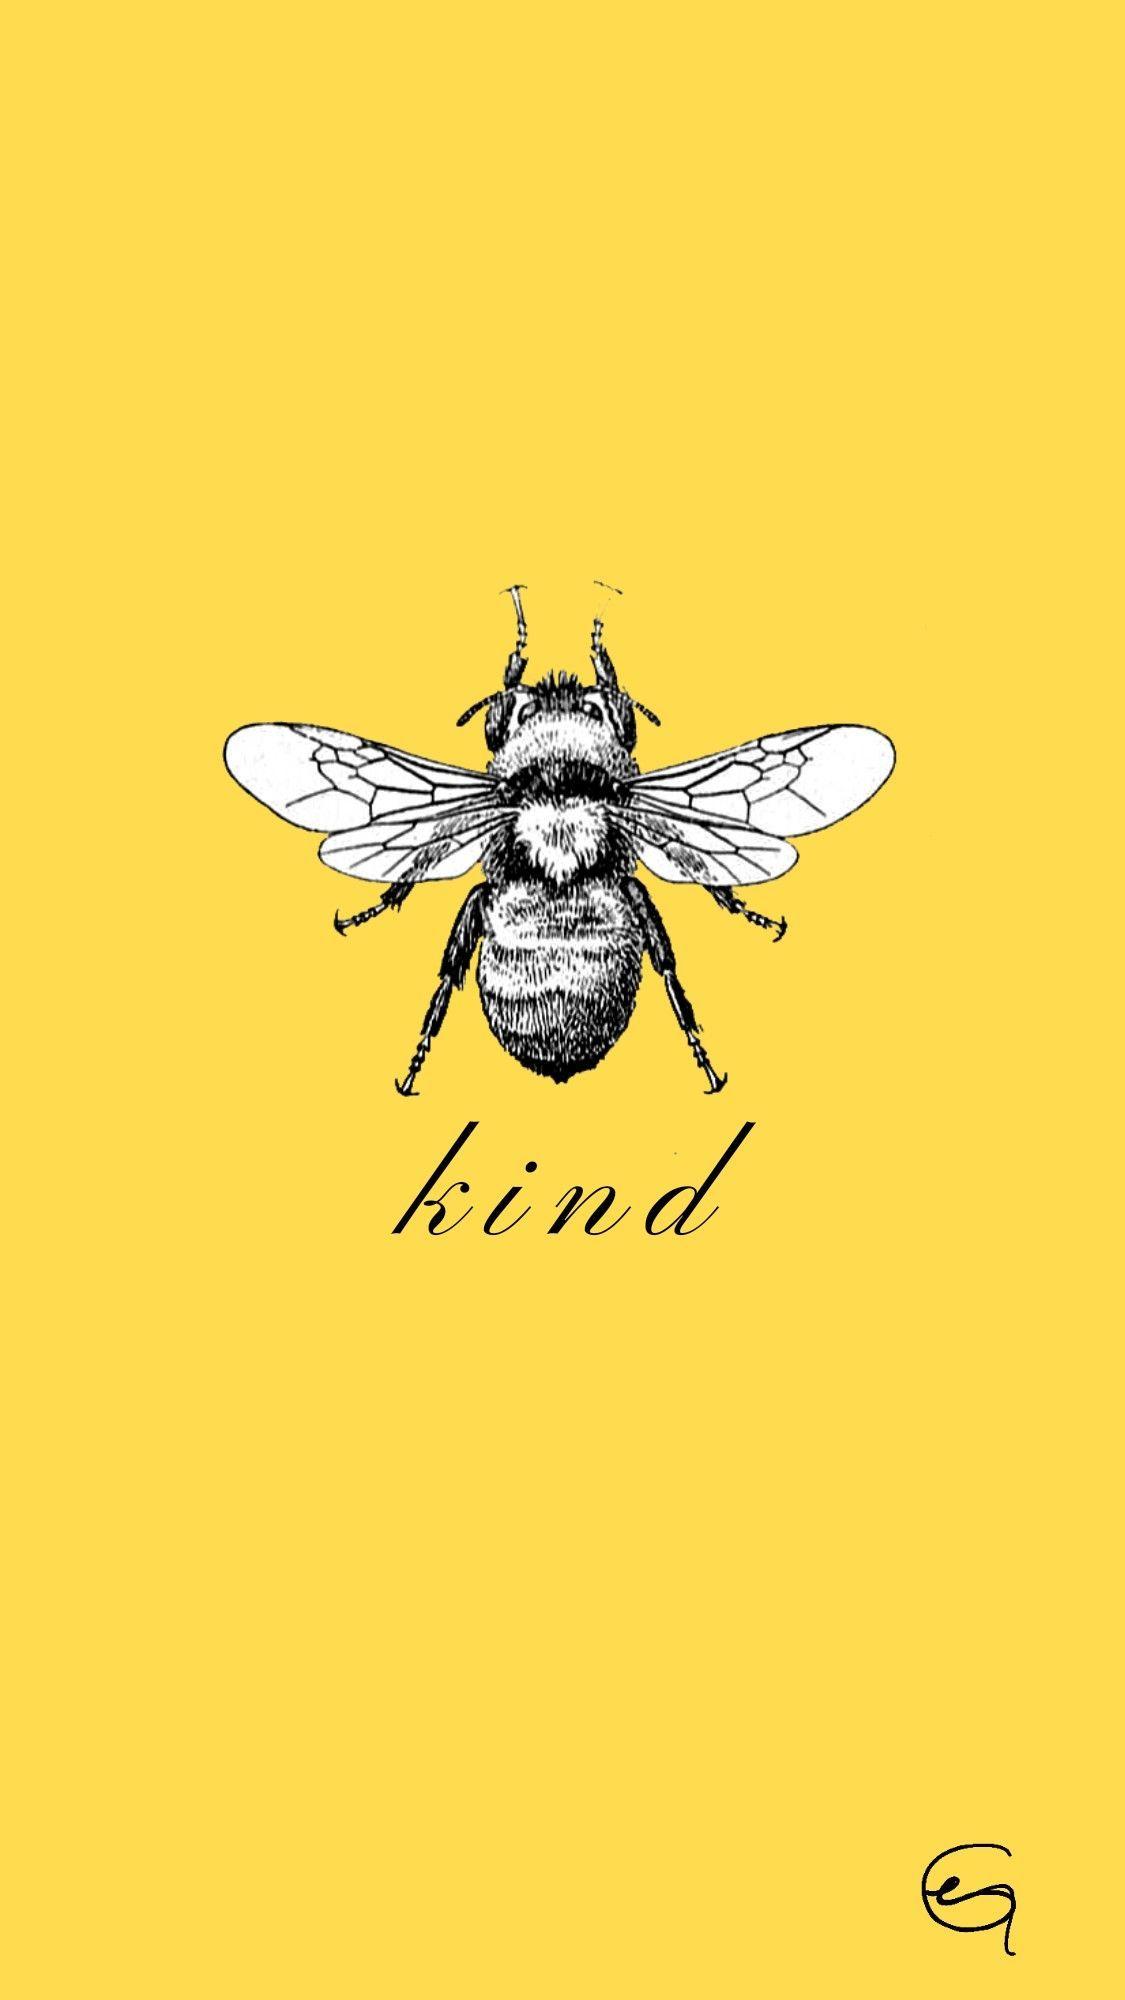 phone wall paper yellow #phonewallpaper yellow bee, 2020 ...